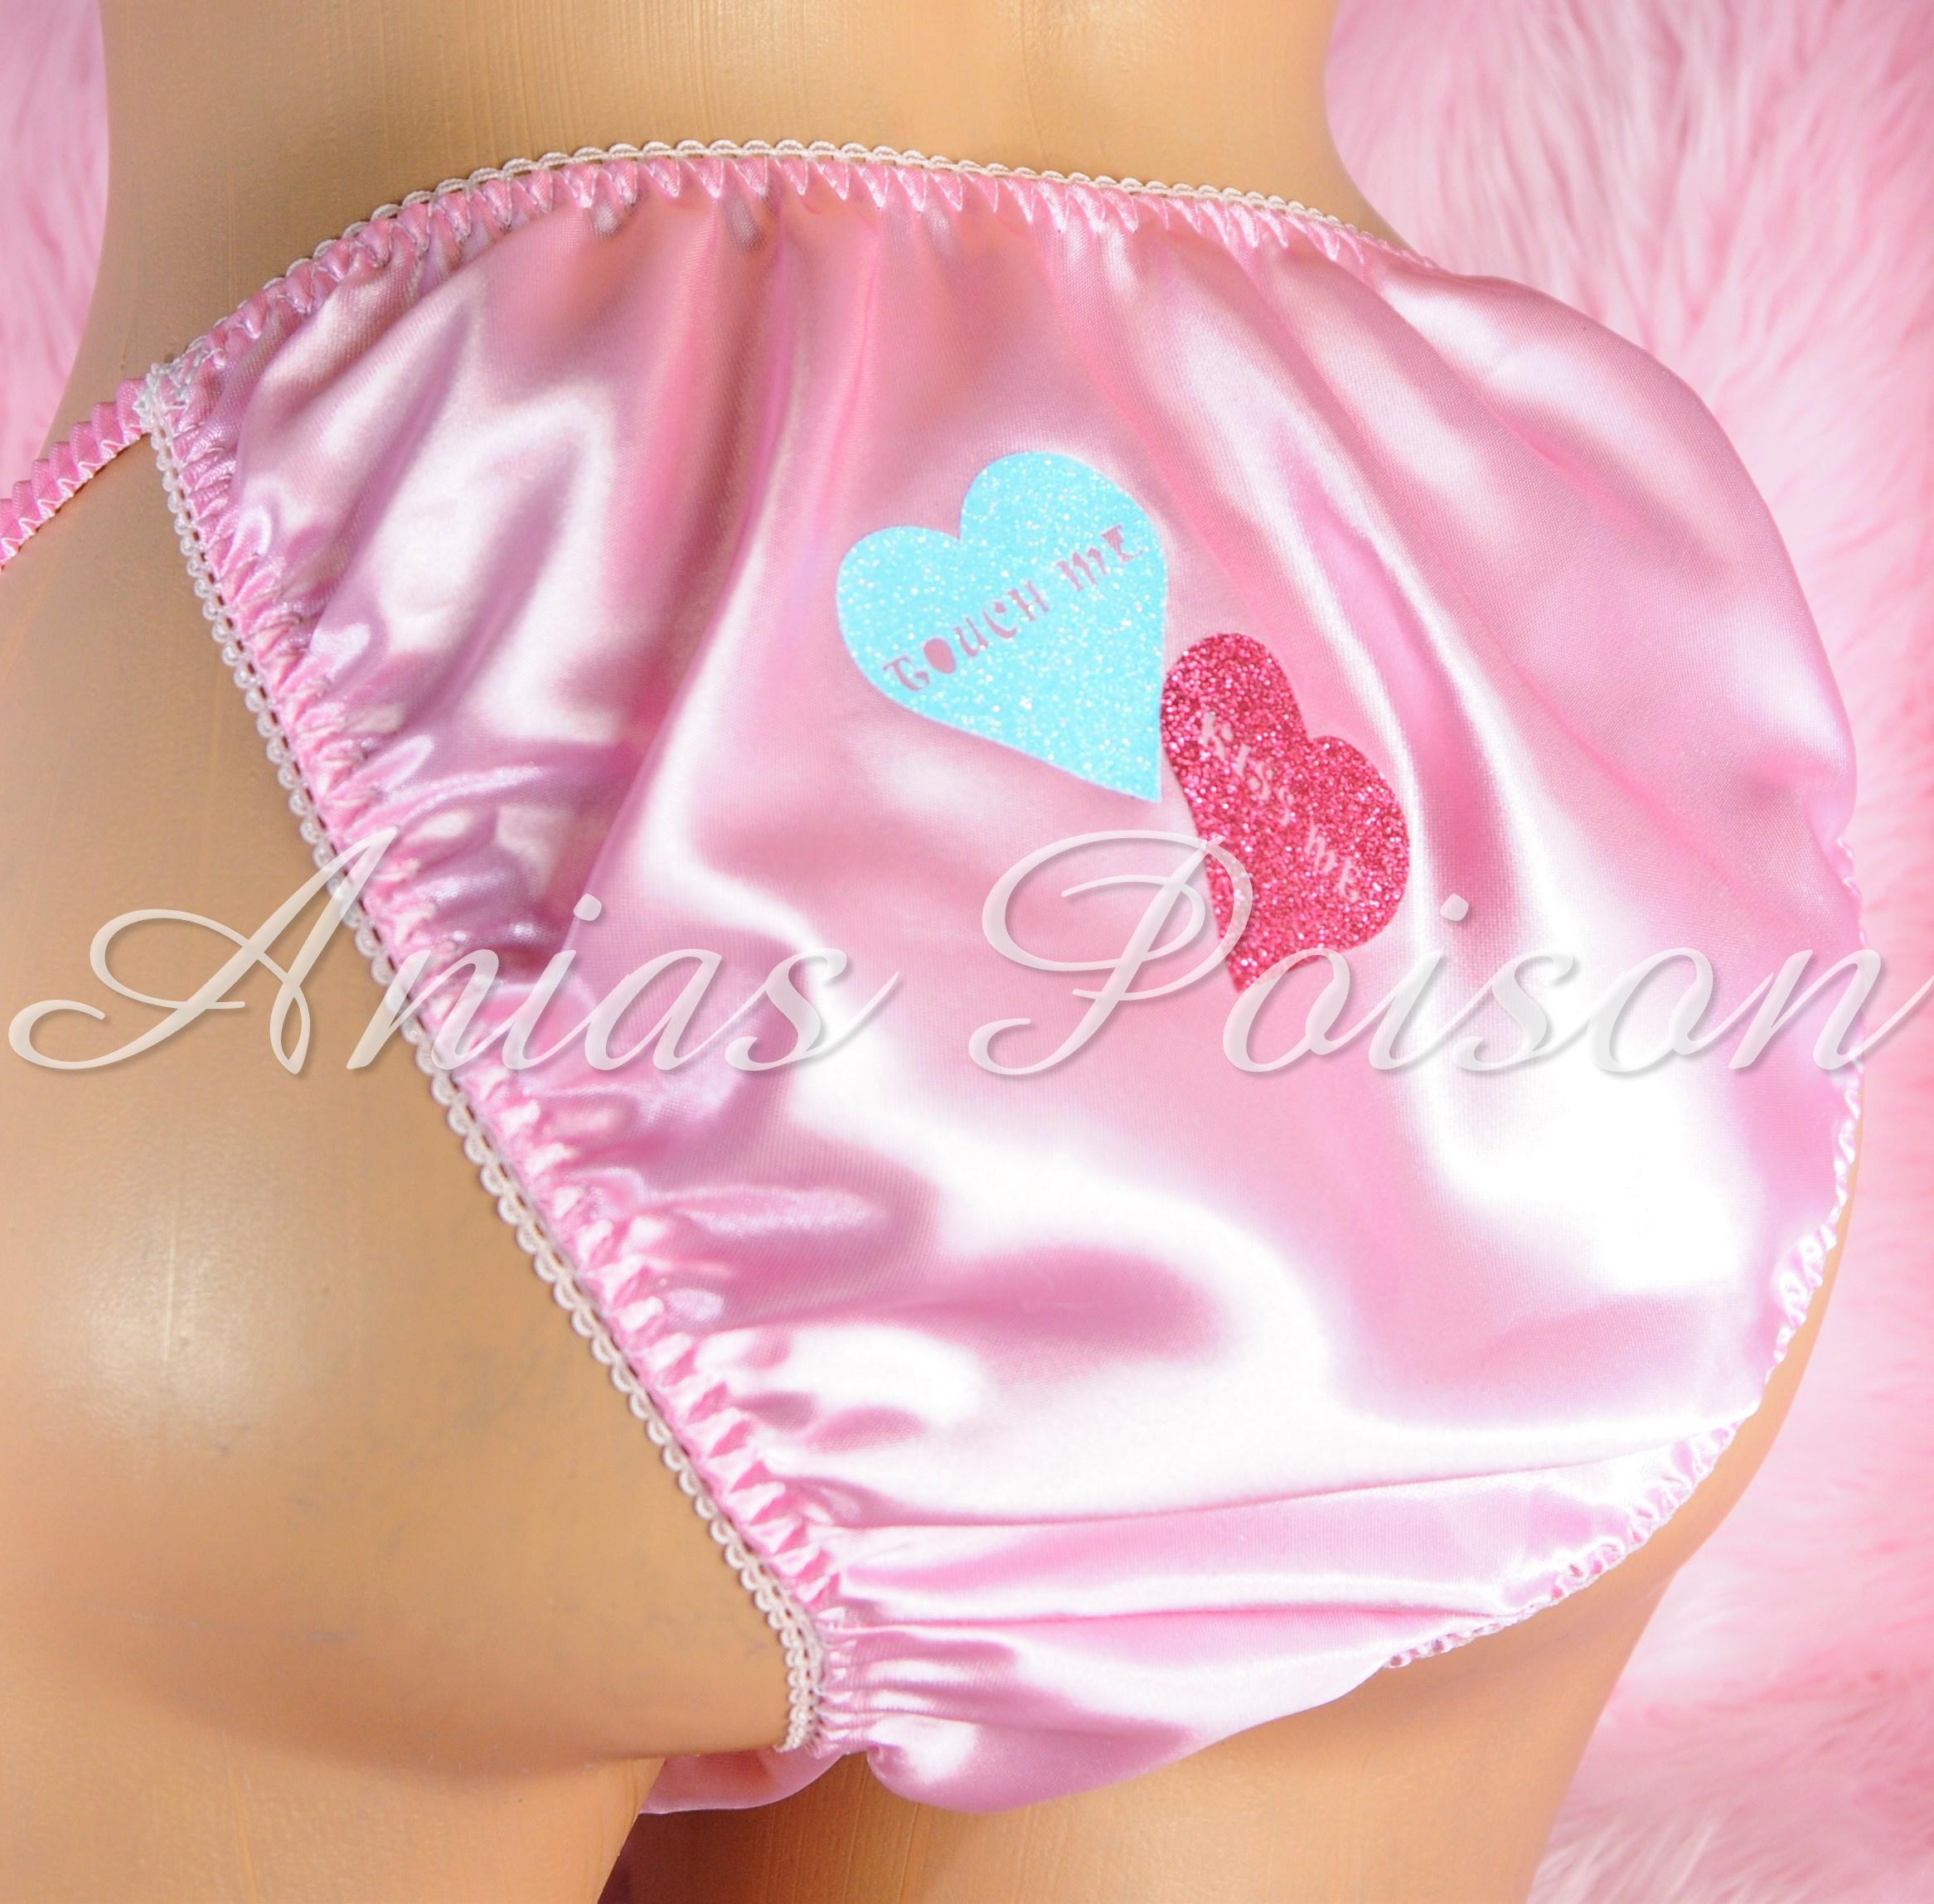 Valentine's Day Satin Mens Sissy Custom Conversation Heart 80s style string bikini panties 00225